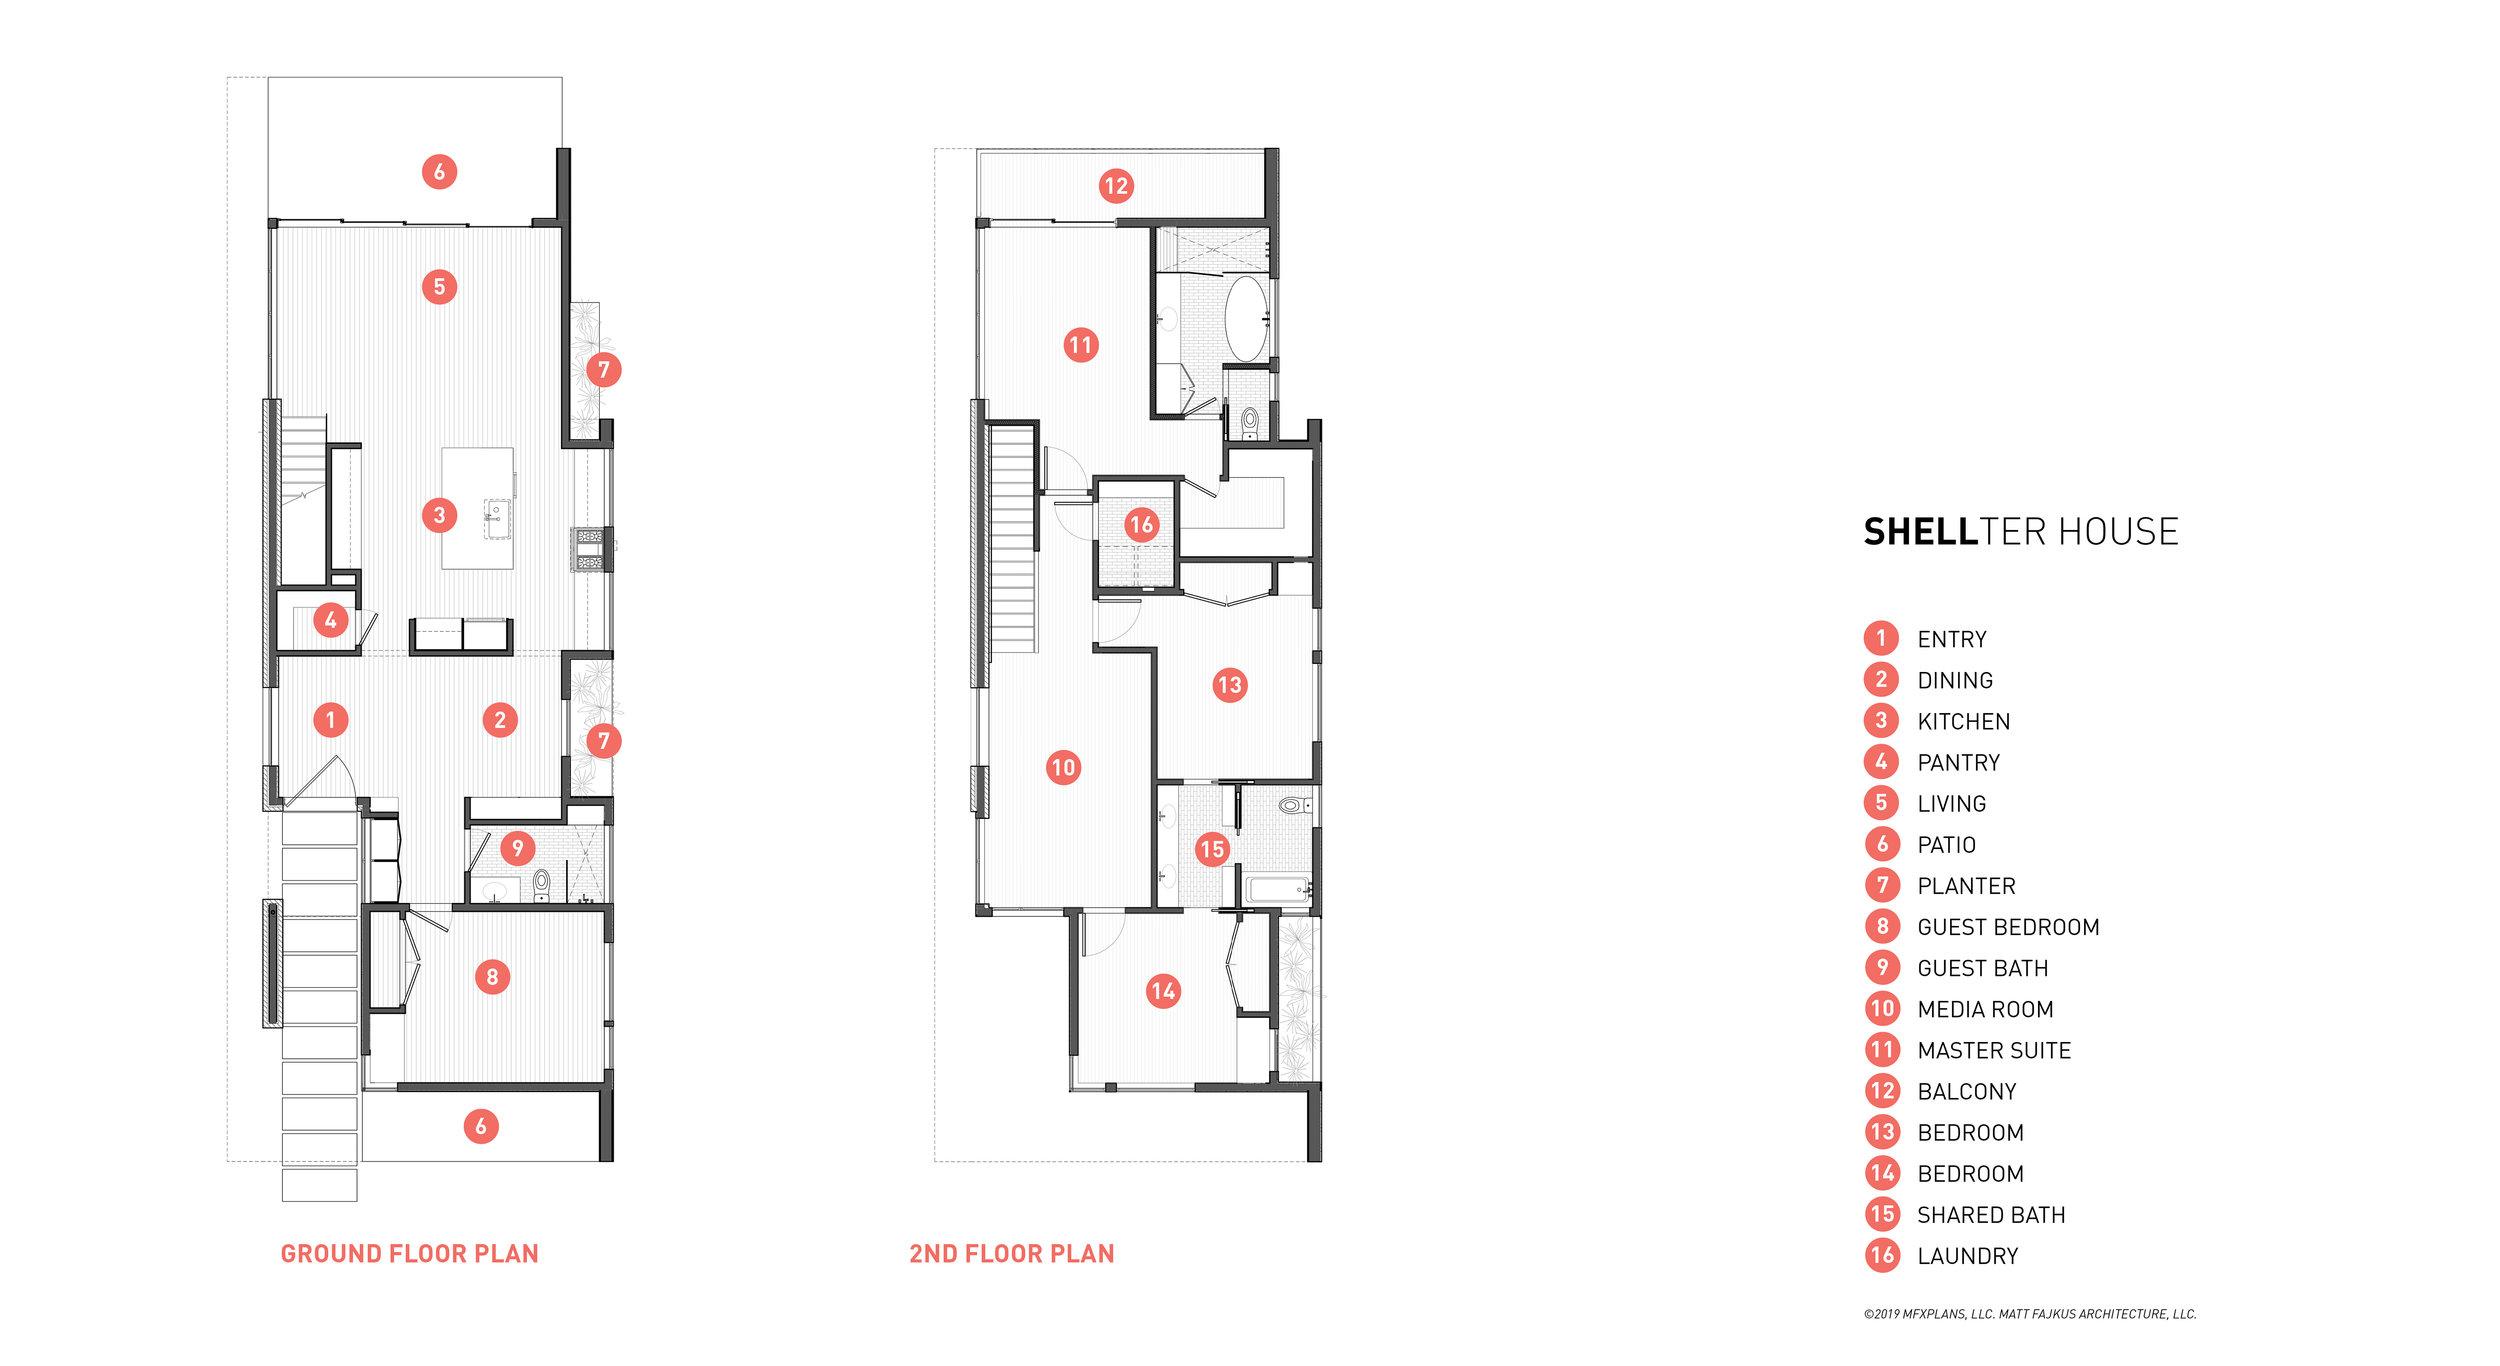 MFxPlans_ShellterHouse_Graphic Plans (web).jpg